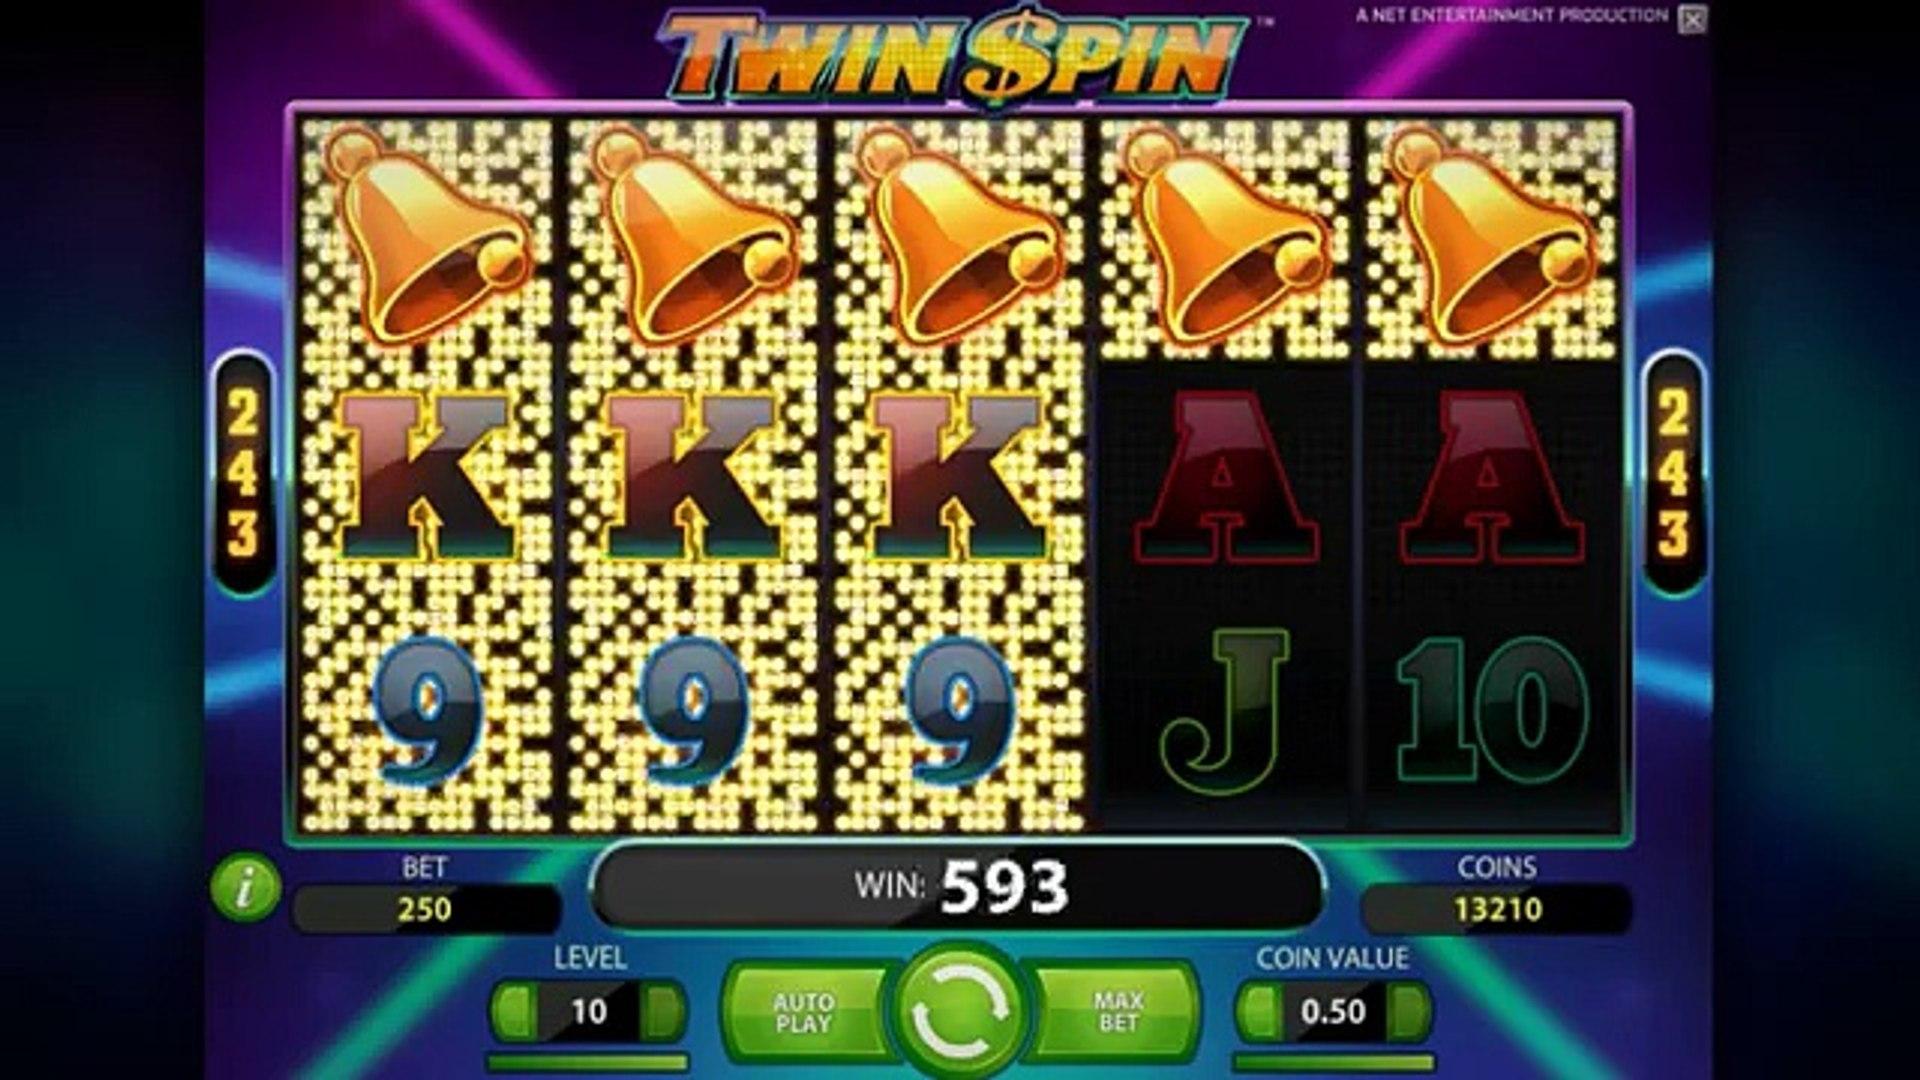 Twin Spin gratis online casino slot machine game